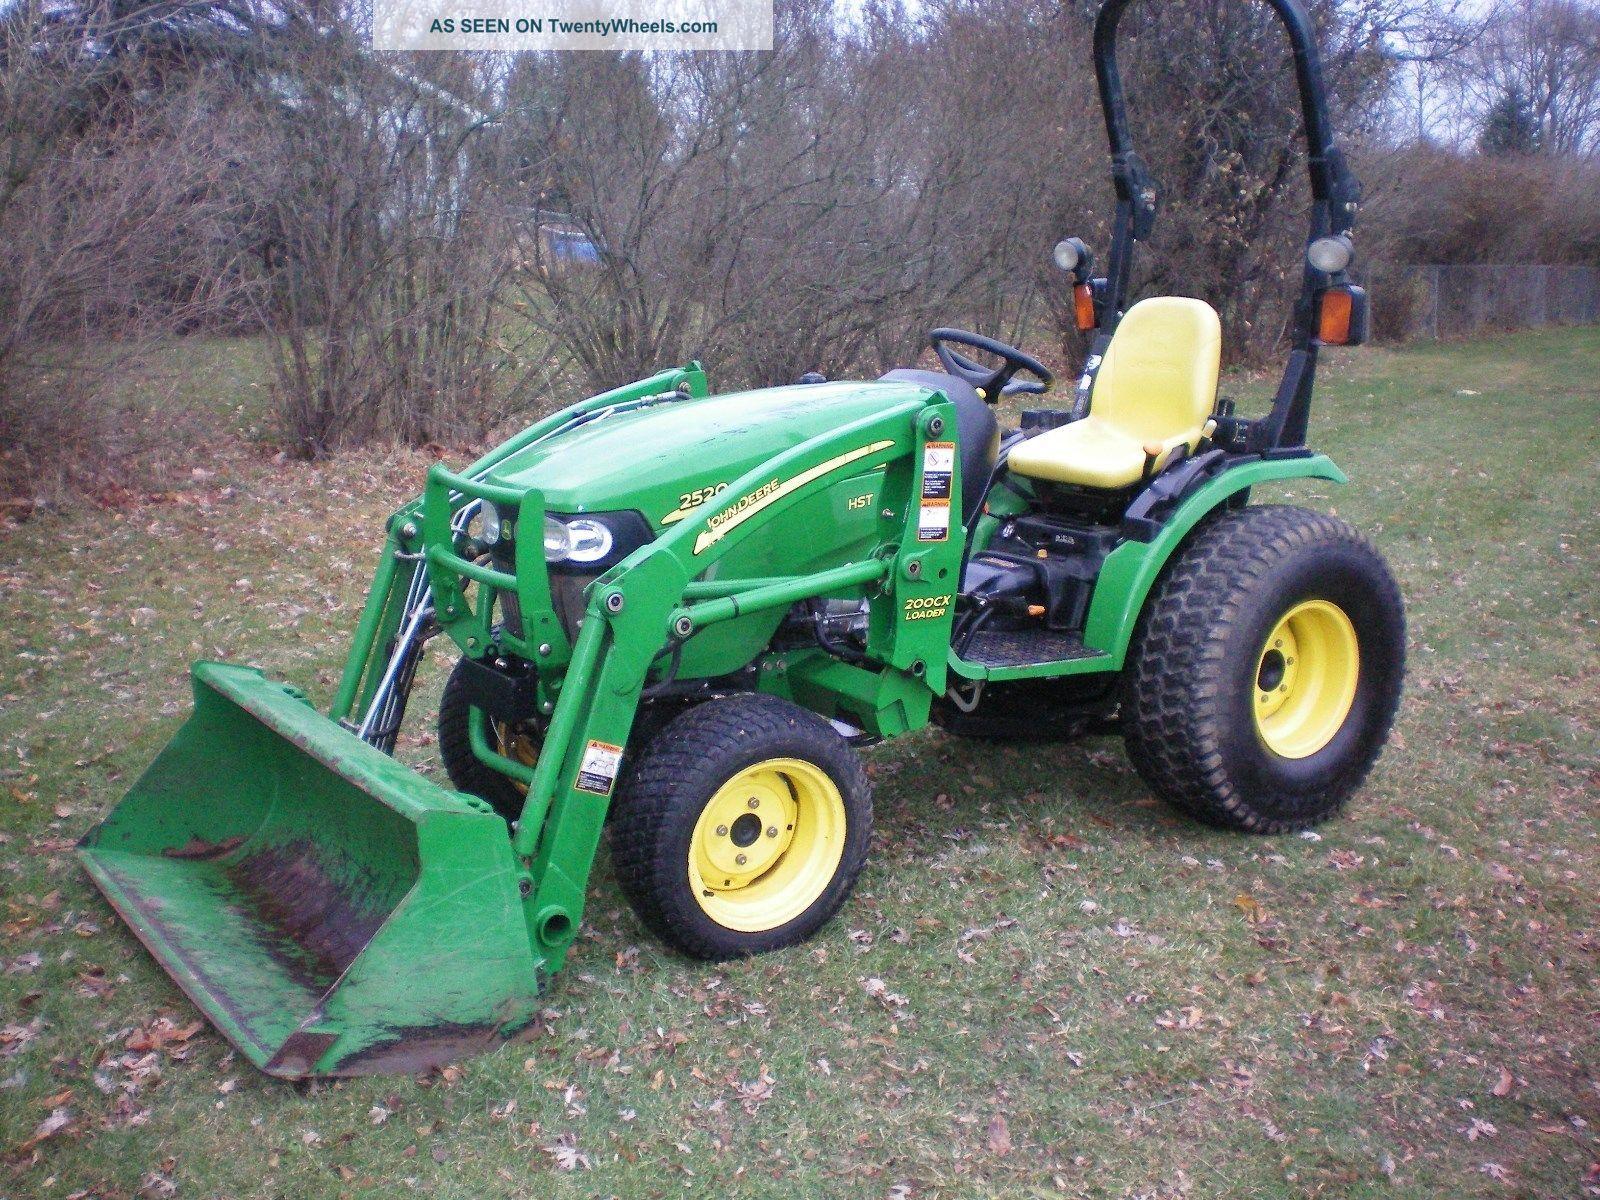 John Deere Compact Tractor Attachments : John deere tractor compact loader mower